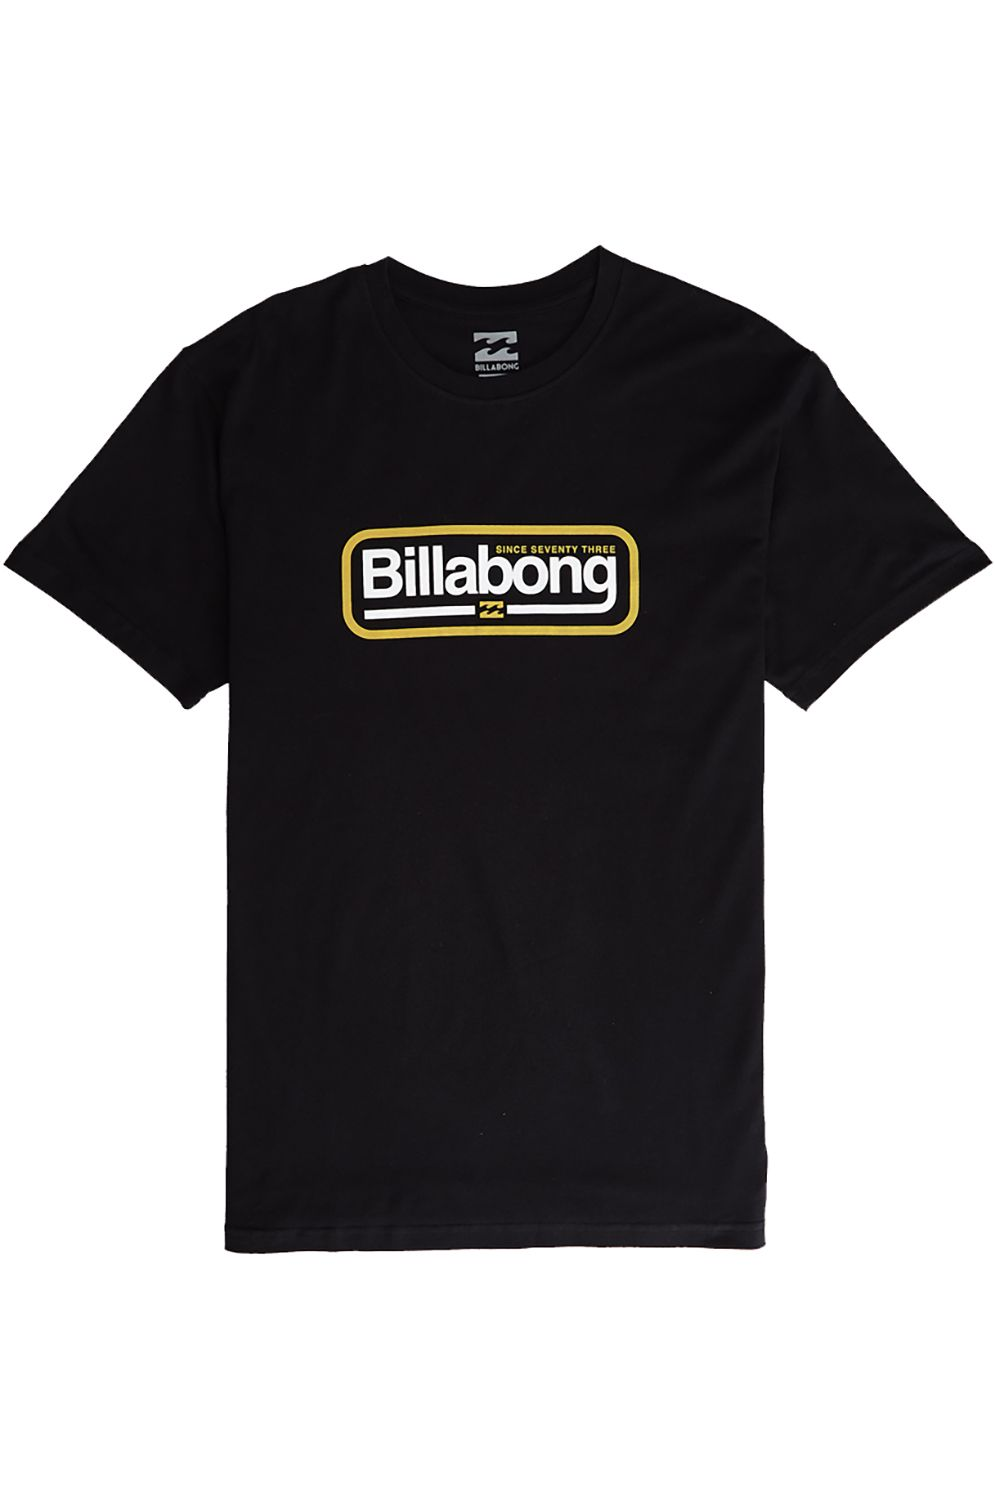 T-Shirt Billabong RIPPLE Black